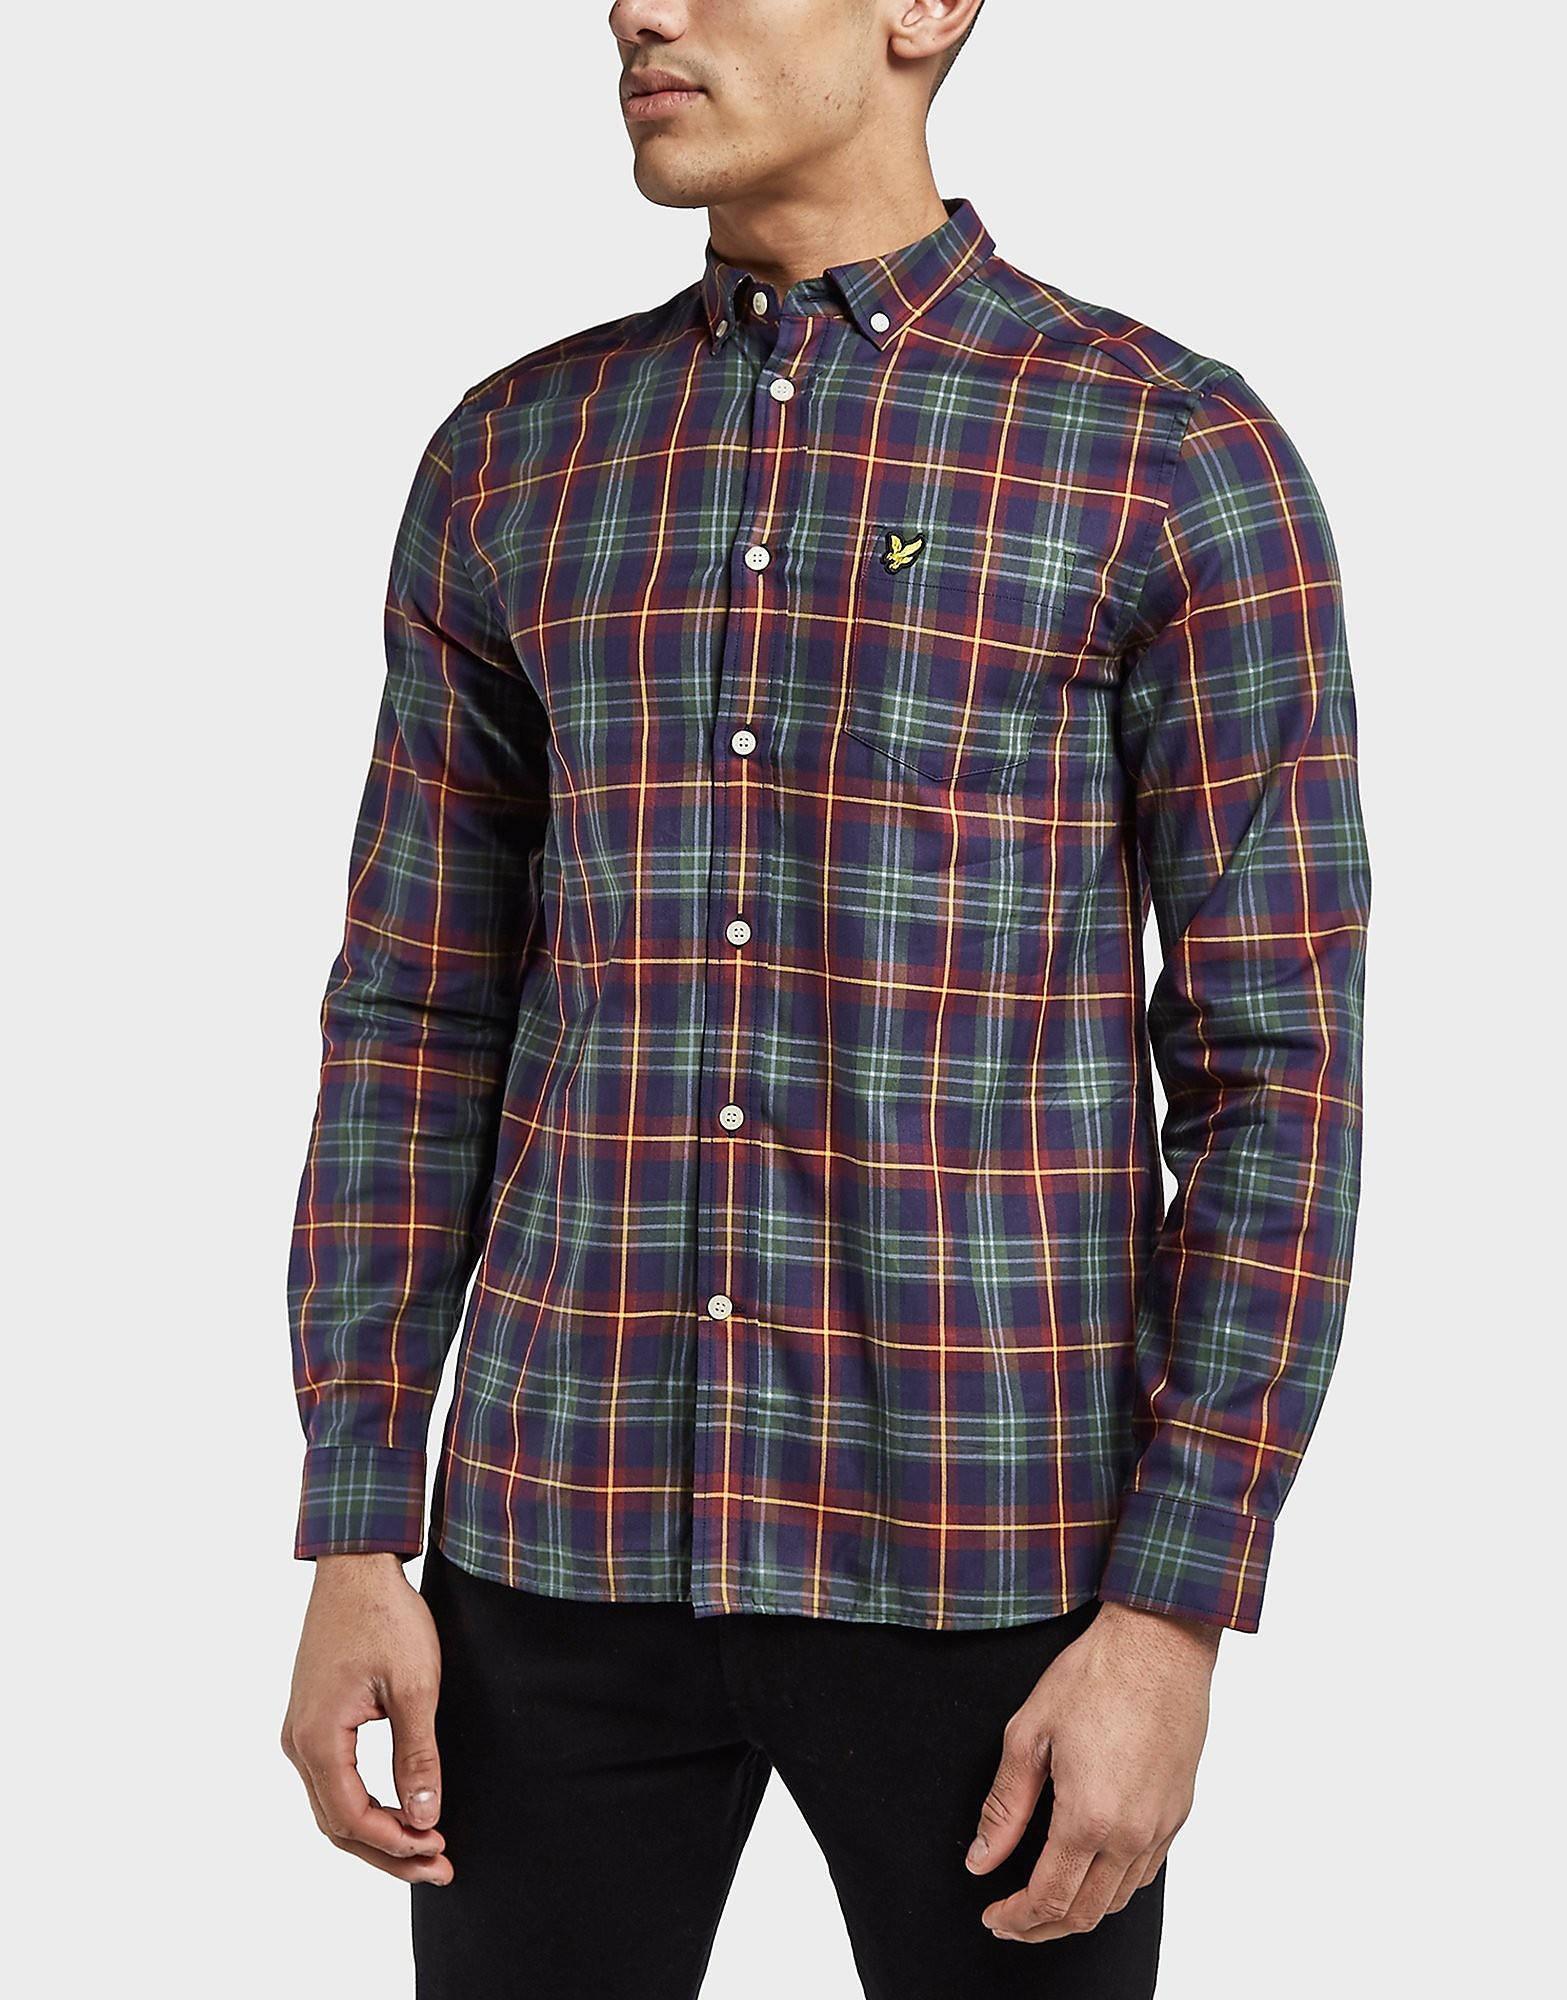 Lyle & Scott Lyle Check Long Sleeve Shirt - Exclusive